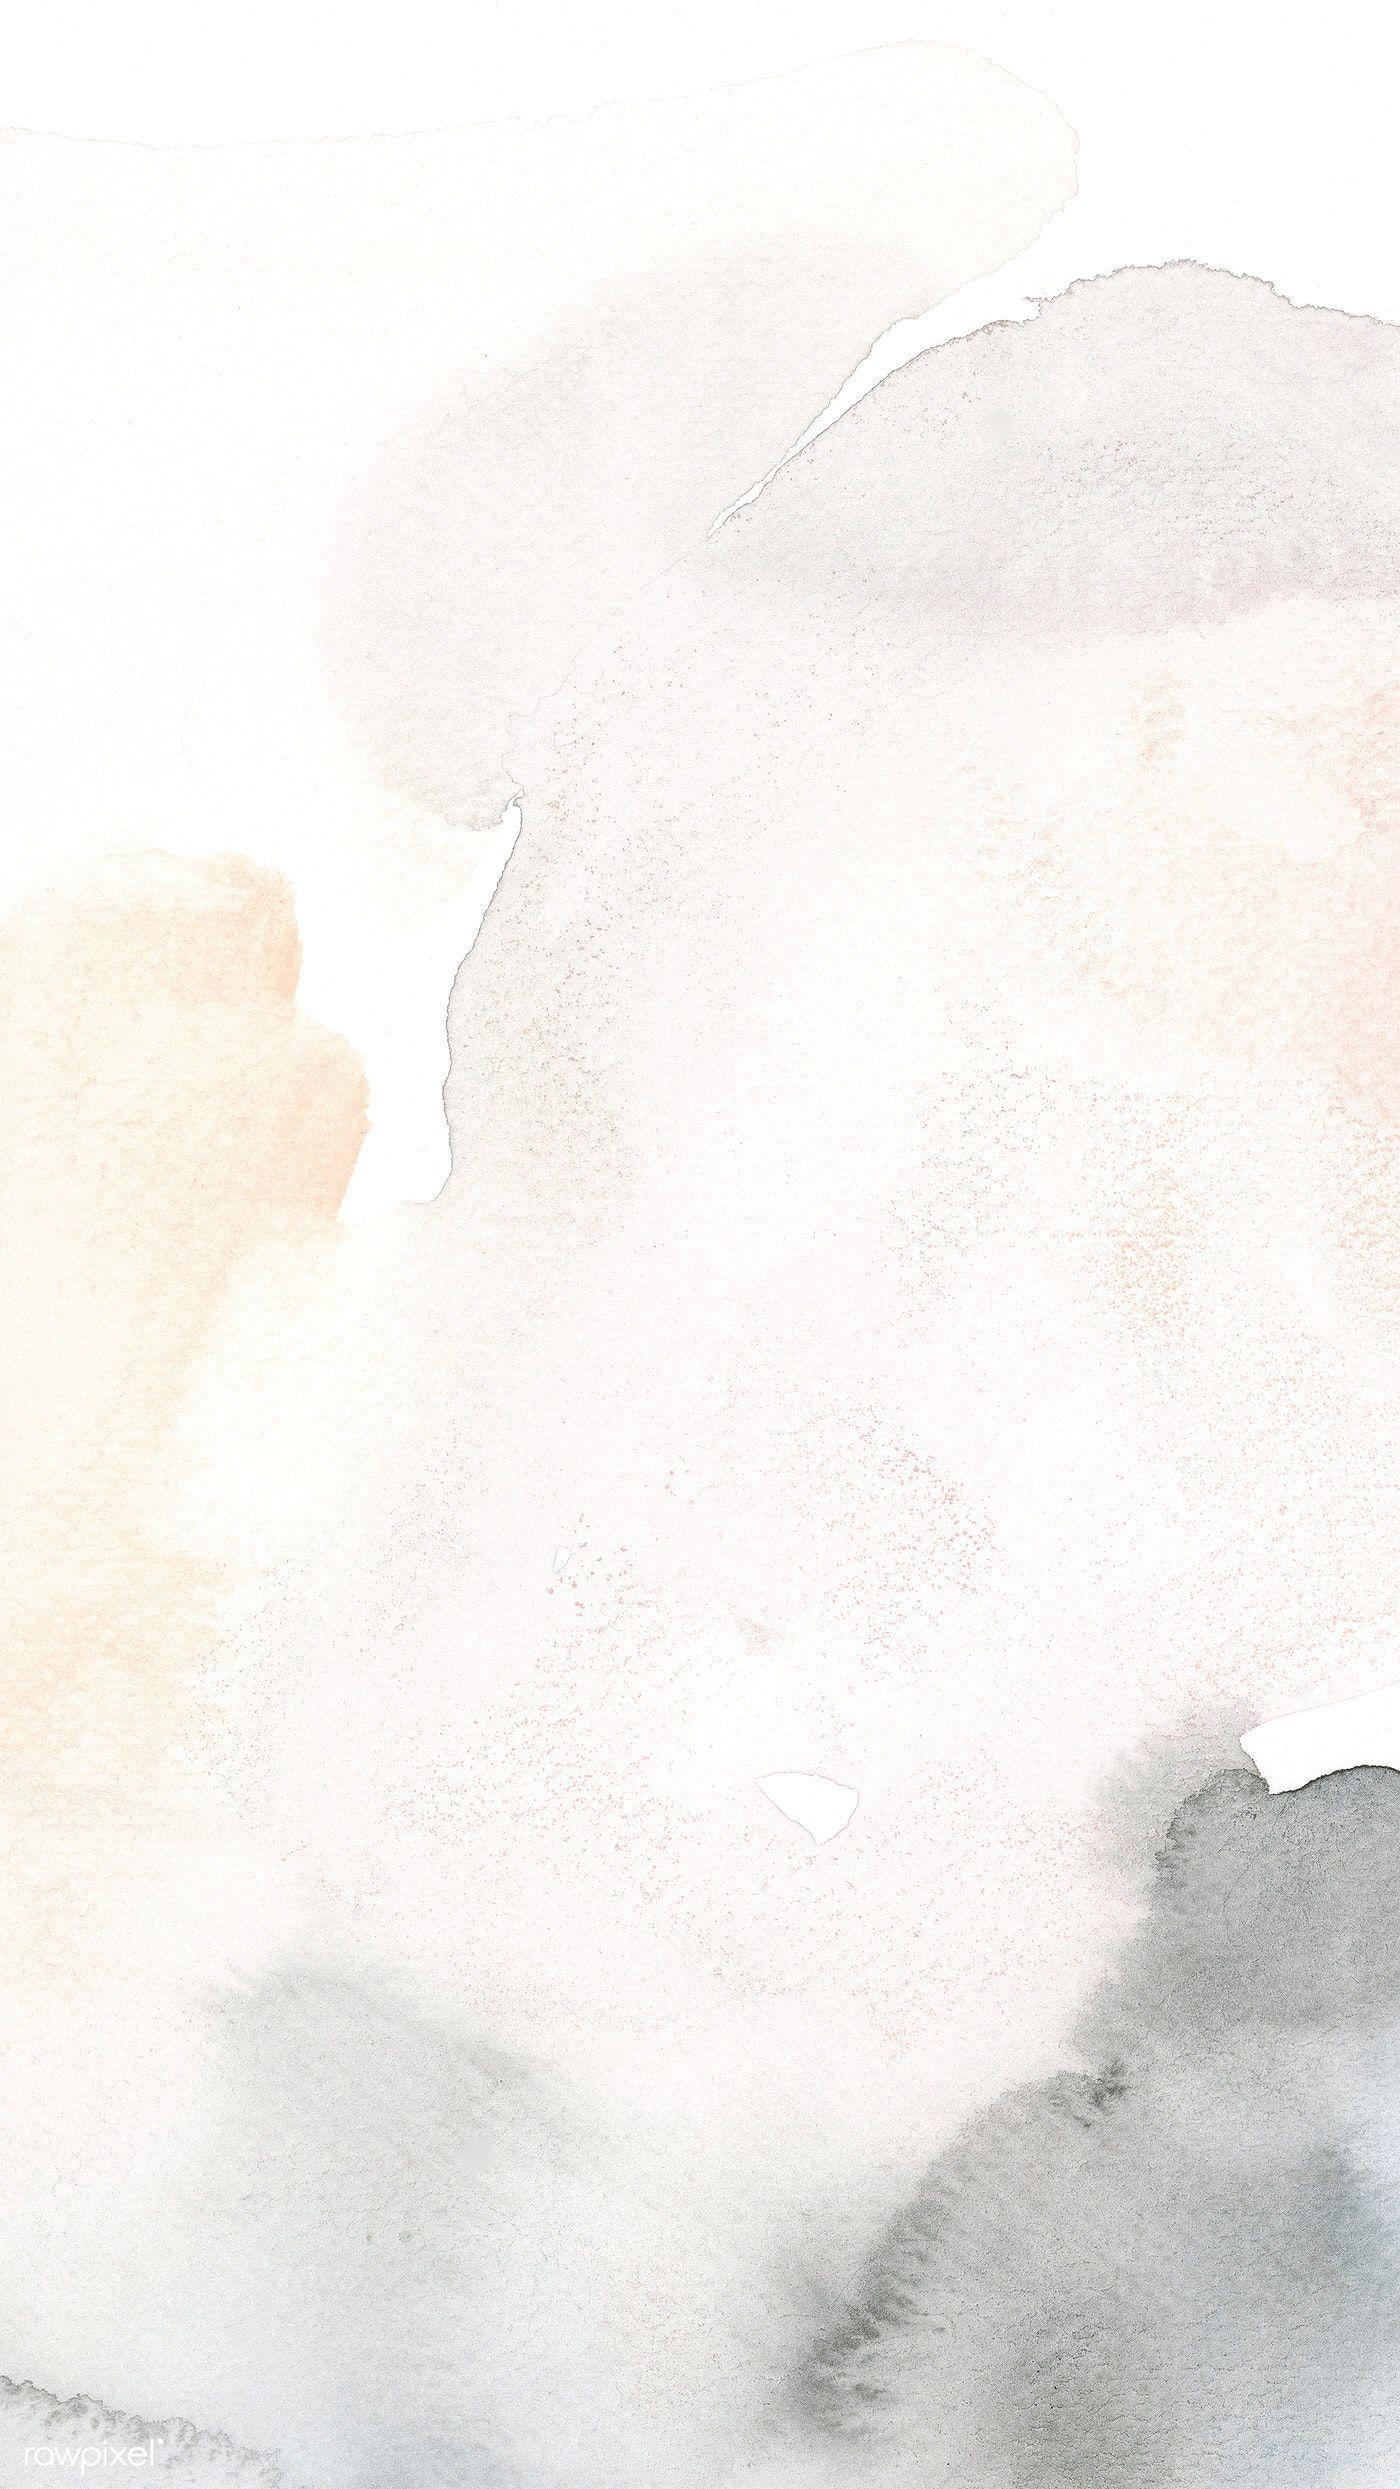 Watercolor Aesthetic Wallpapers Wallpaper Cave